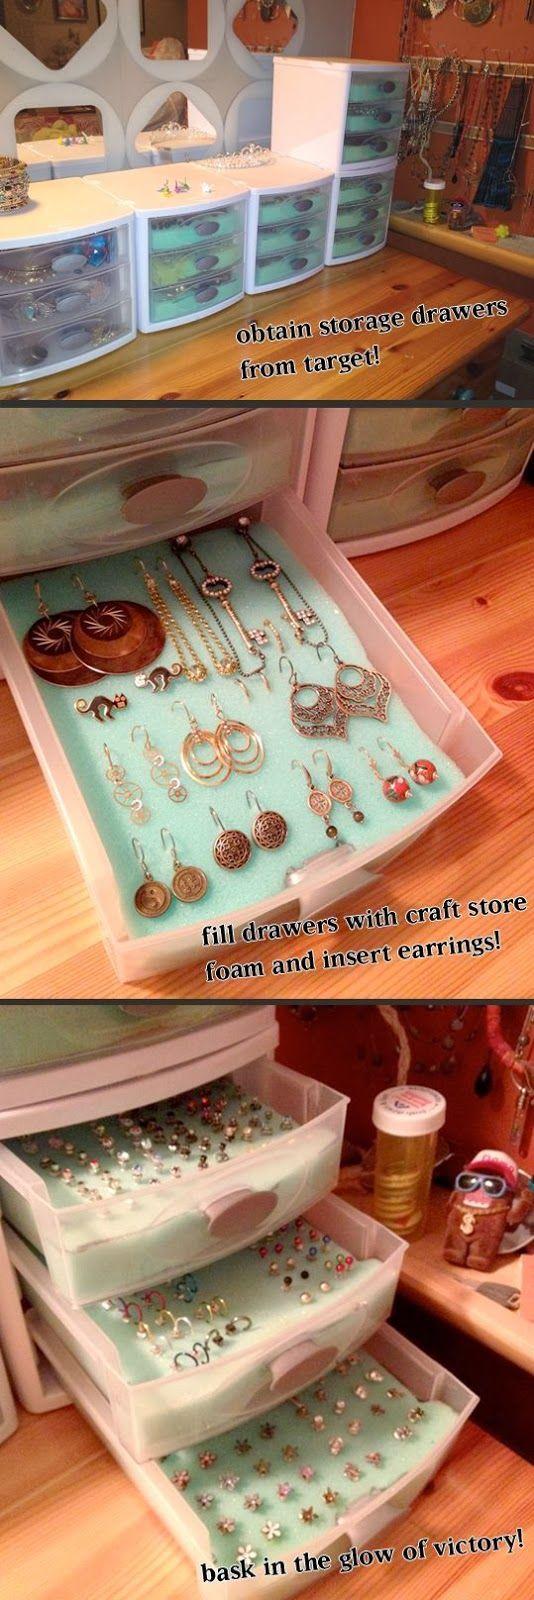 Fun Home Things: 12 Organizing Ideas Like the earring storage